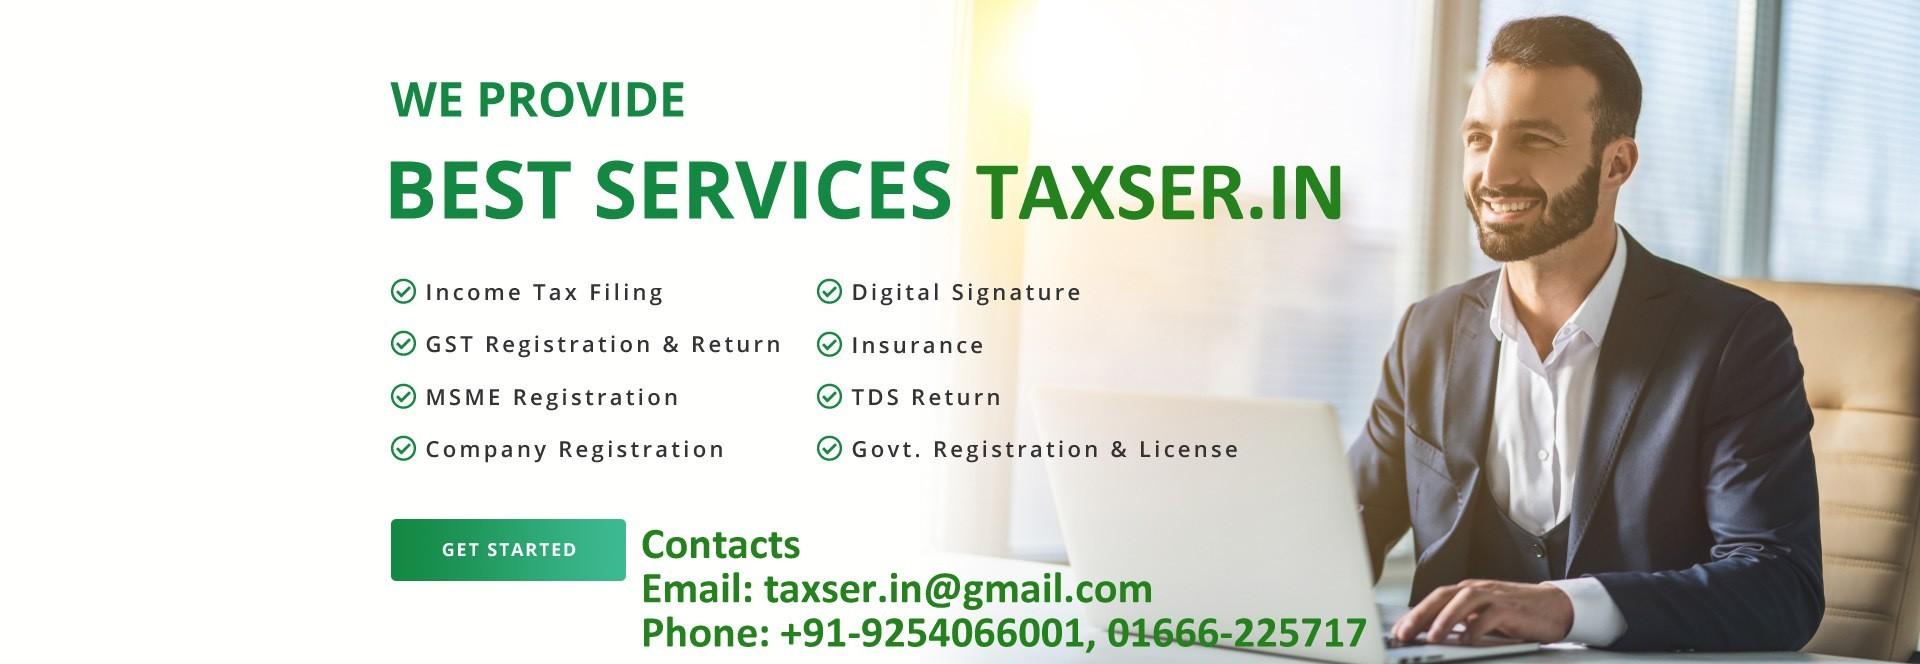 TDS Return Service Provider in India.Taxation Company in Sirsa, Tax Sirsa, Tax, Income tax, Sirsa, T